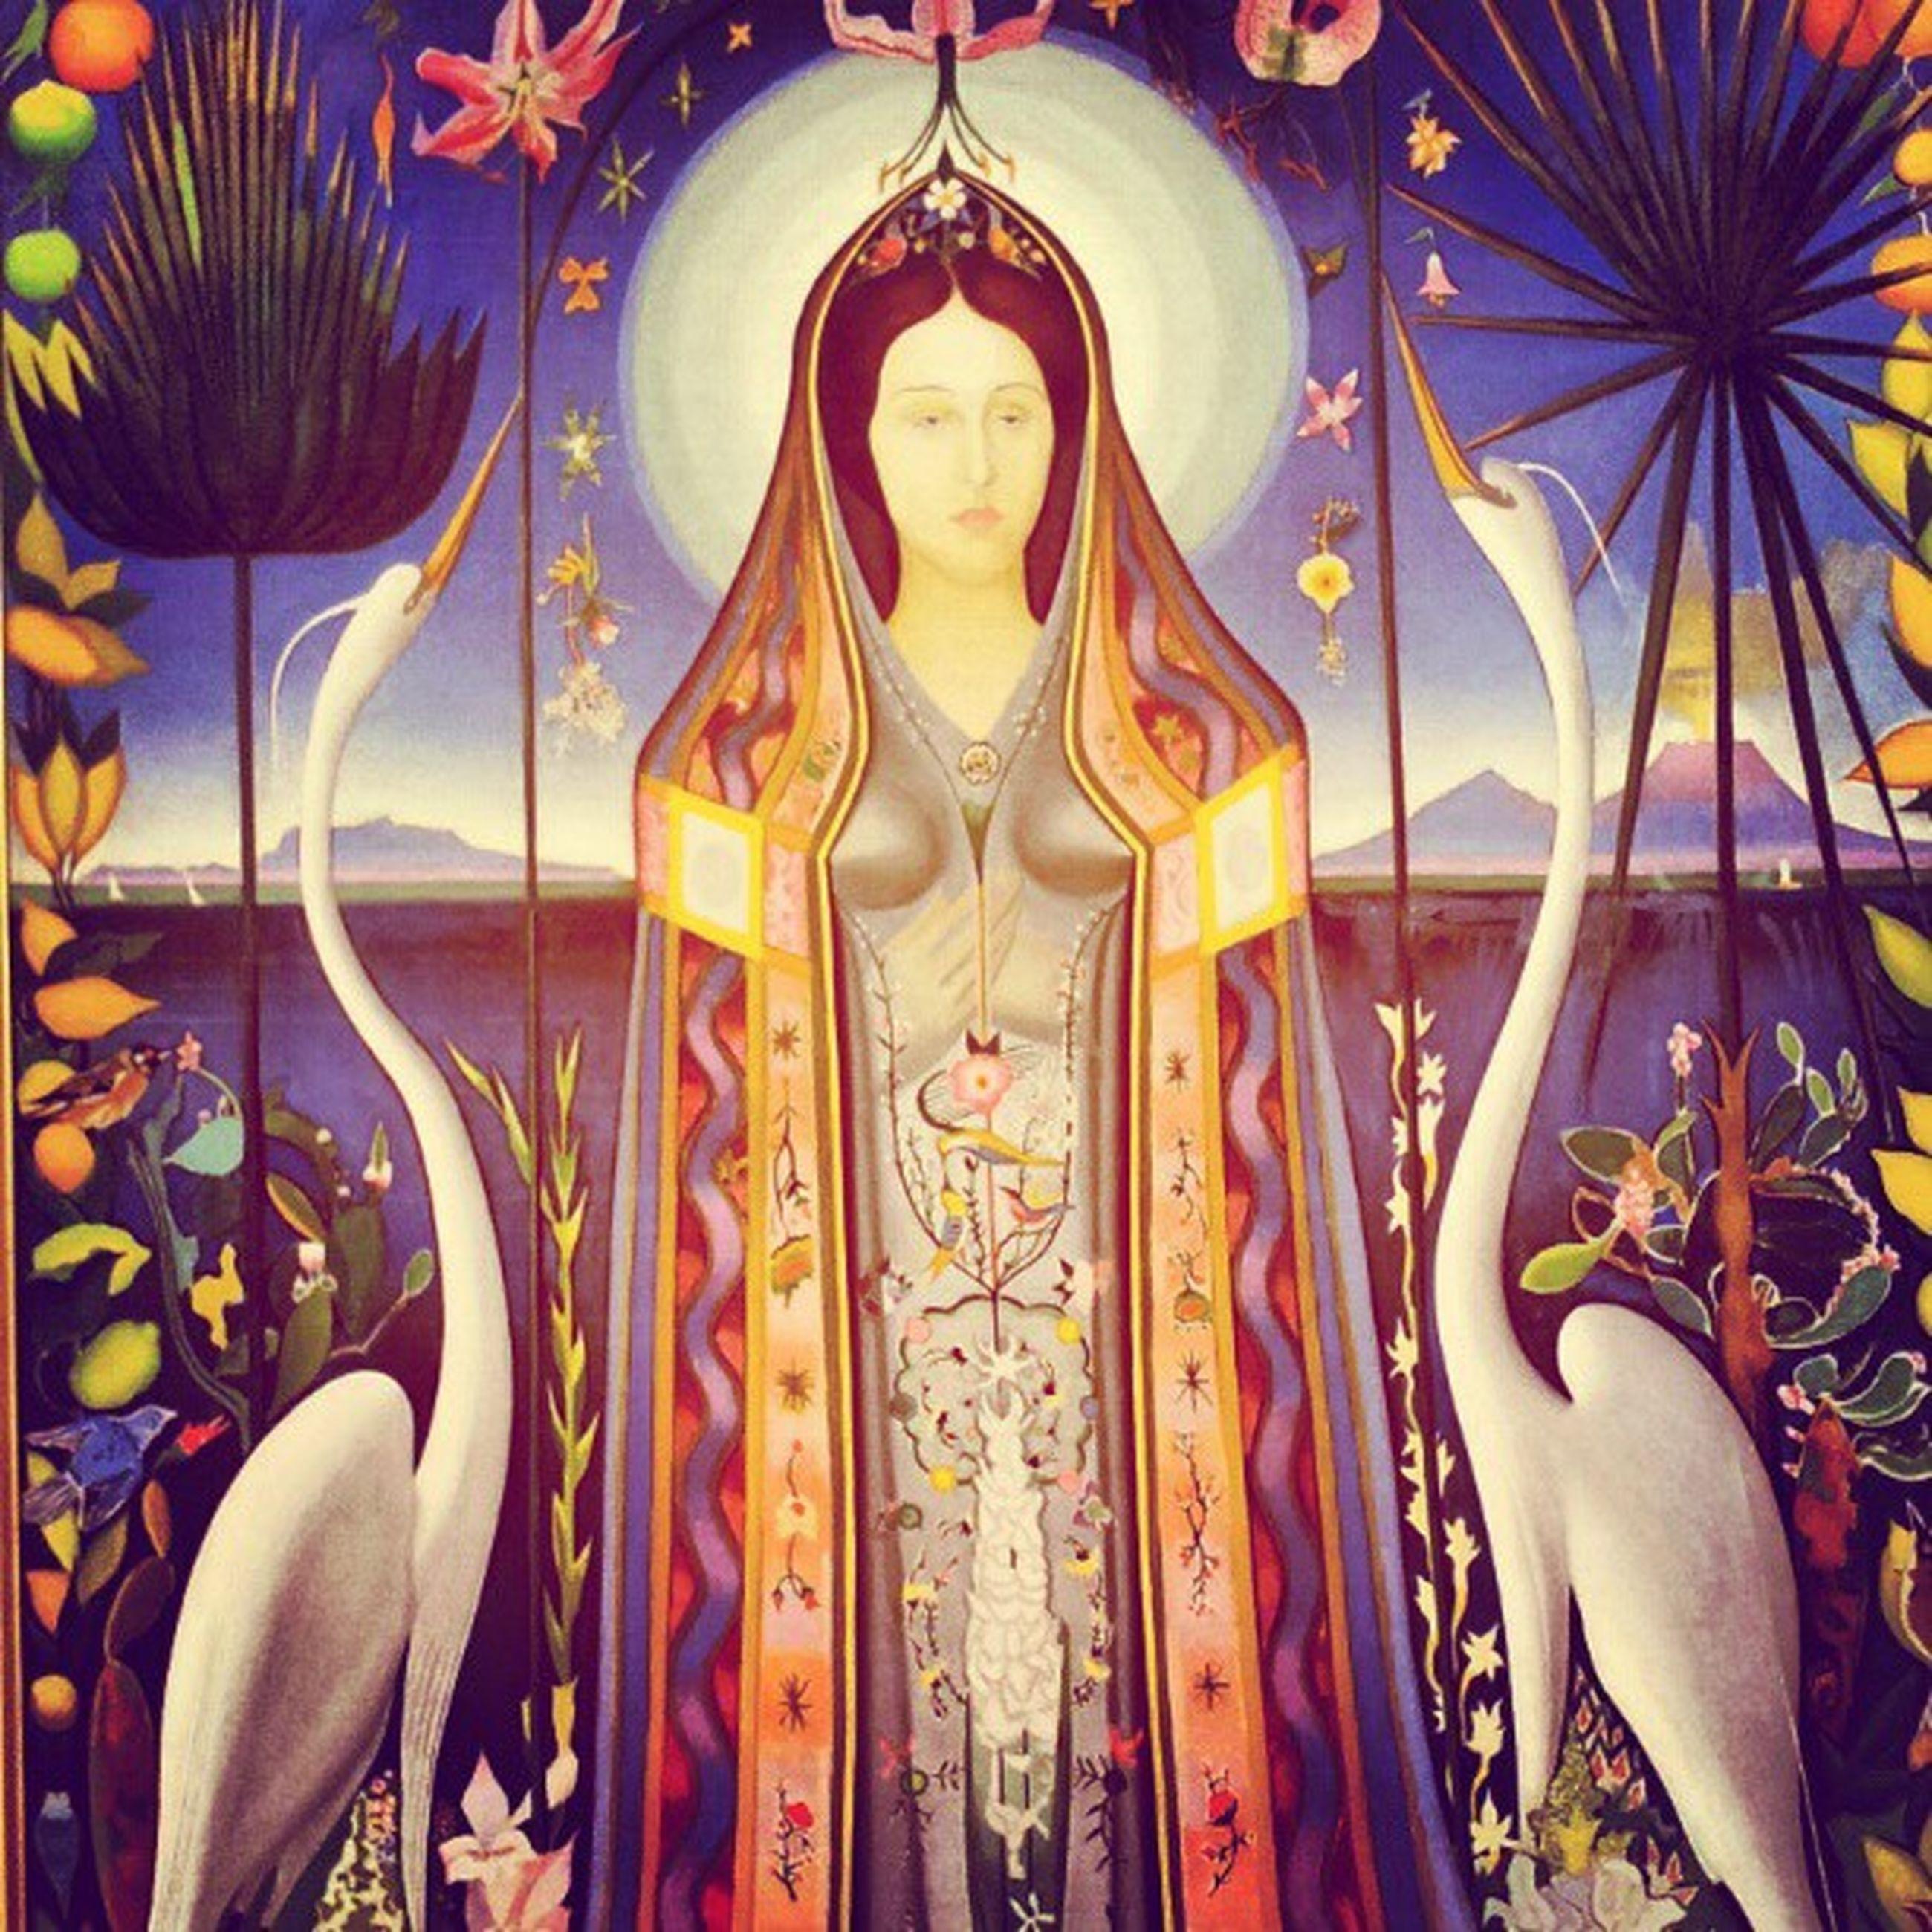 art, art and craft, creativity, human representation, sculpture, statue, spirituality, religion, indoors, place of worship, buddha, multi colored, animal representation, craft, carving - craft product, design